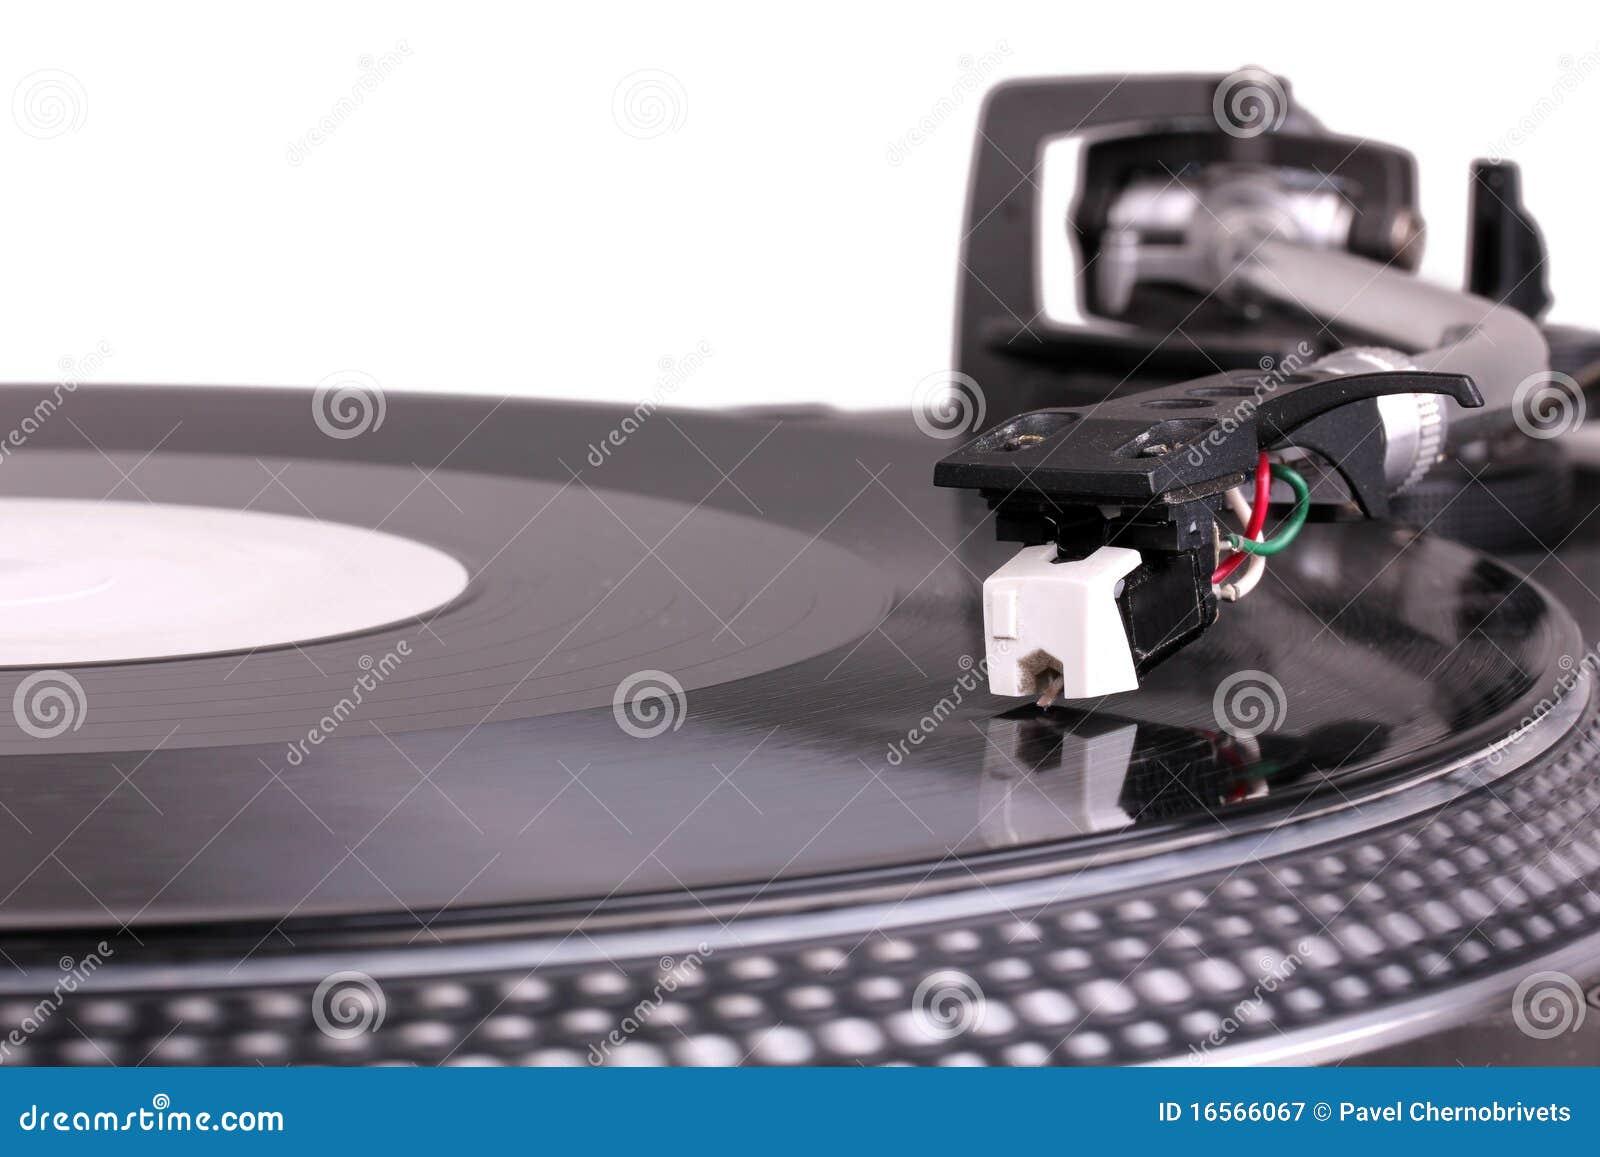 Dj Needle On Spinning Turntable Royalty Free Stock ...